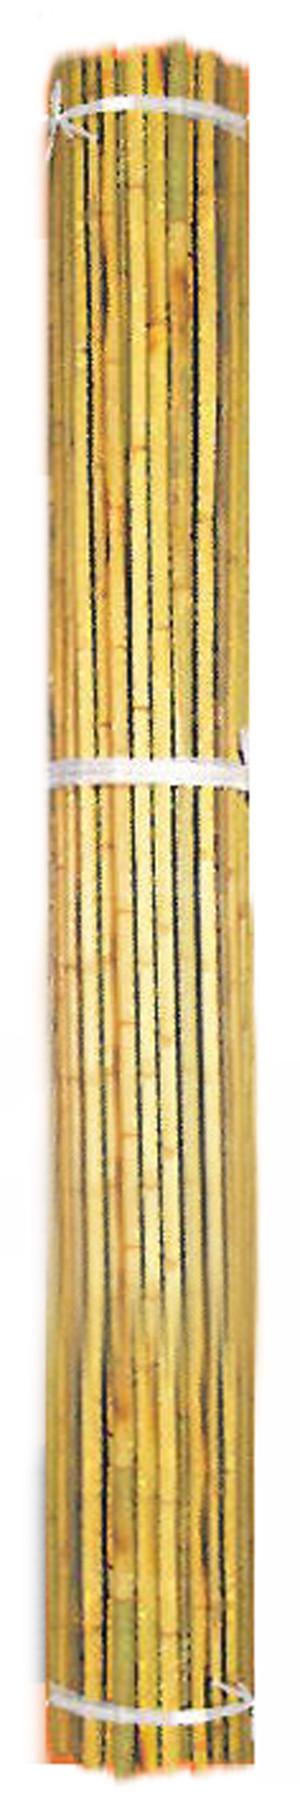 Bond Natural Bamboo Stake Bulk Brown 500ea/3/8Inx4 ft